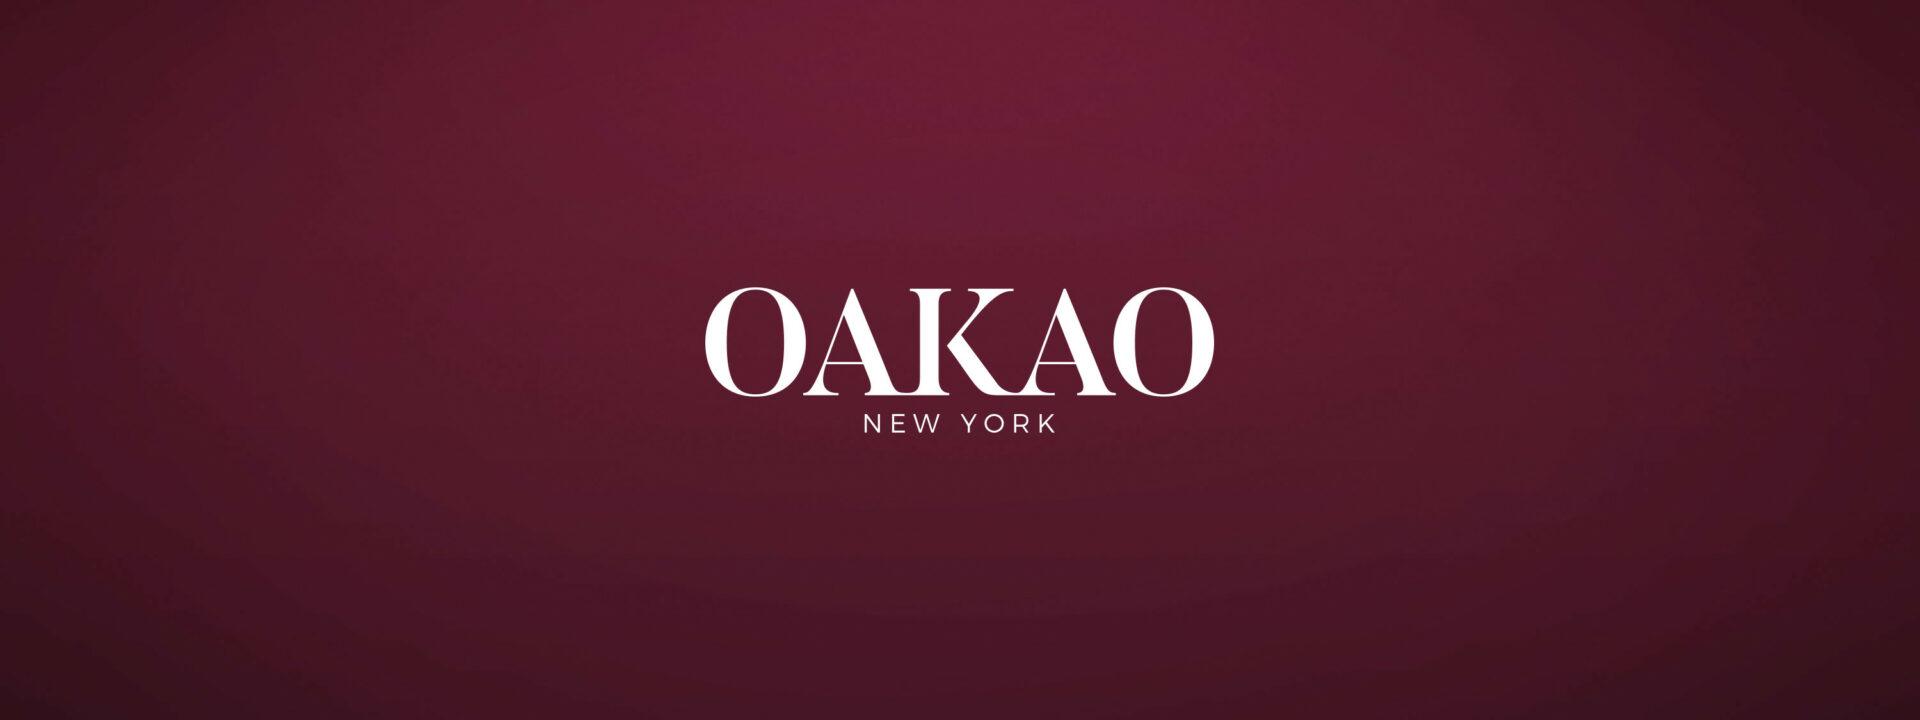 Werbeagentur Heidelberg - Oakao 5